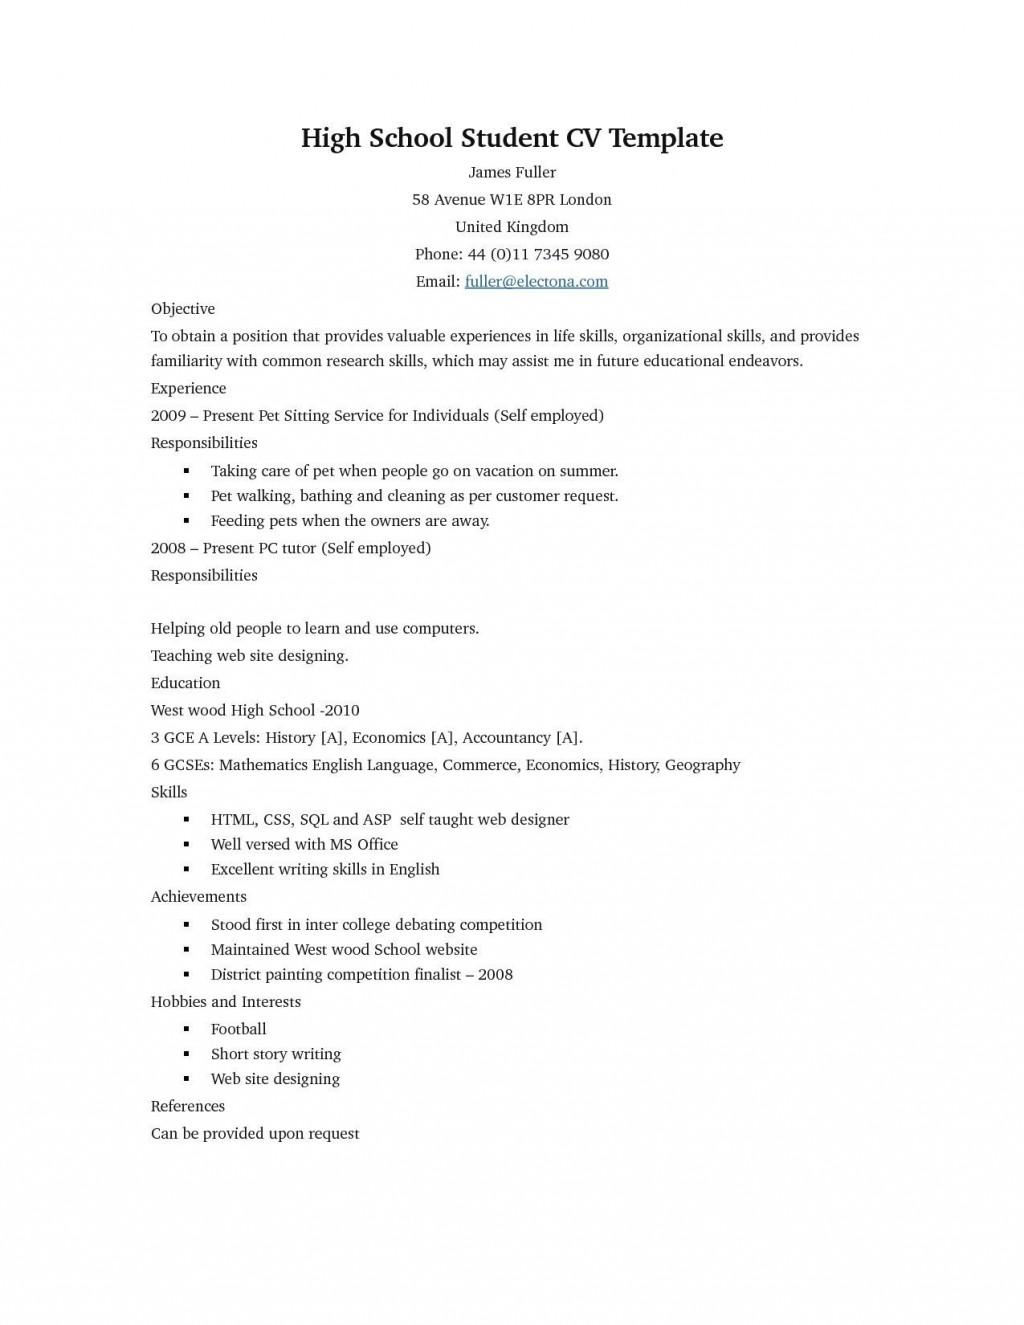 006 Top Free High School Graduate Resume Template Picture  TemplatesLarge